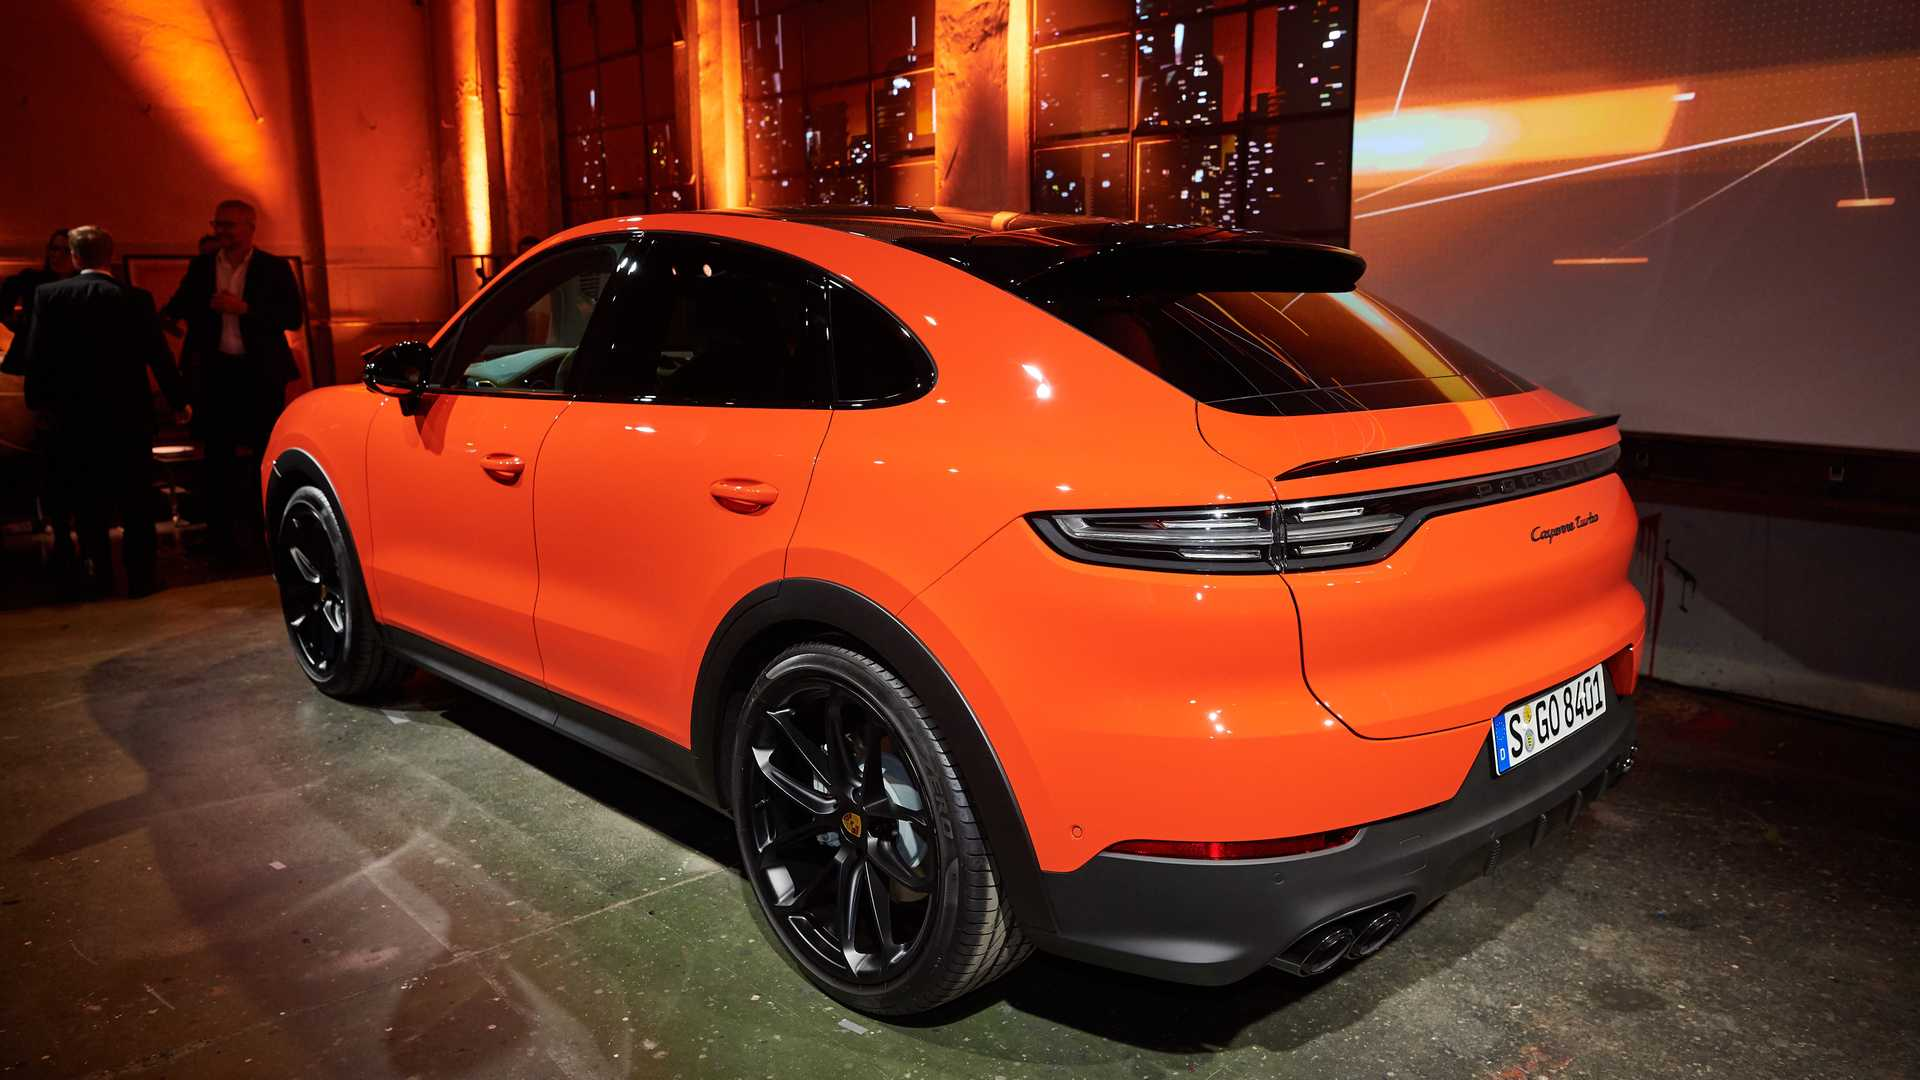 Porsche Cayenne Coupe Shows Unusual Shape In Videos Live Pics 1920x1080